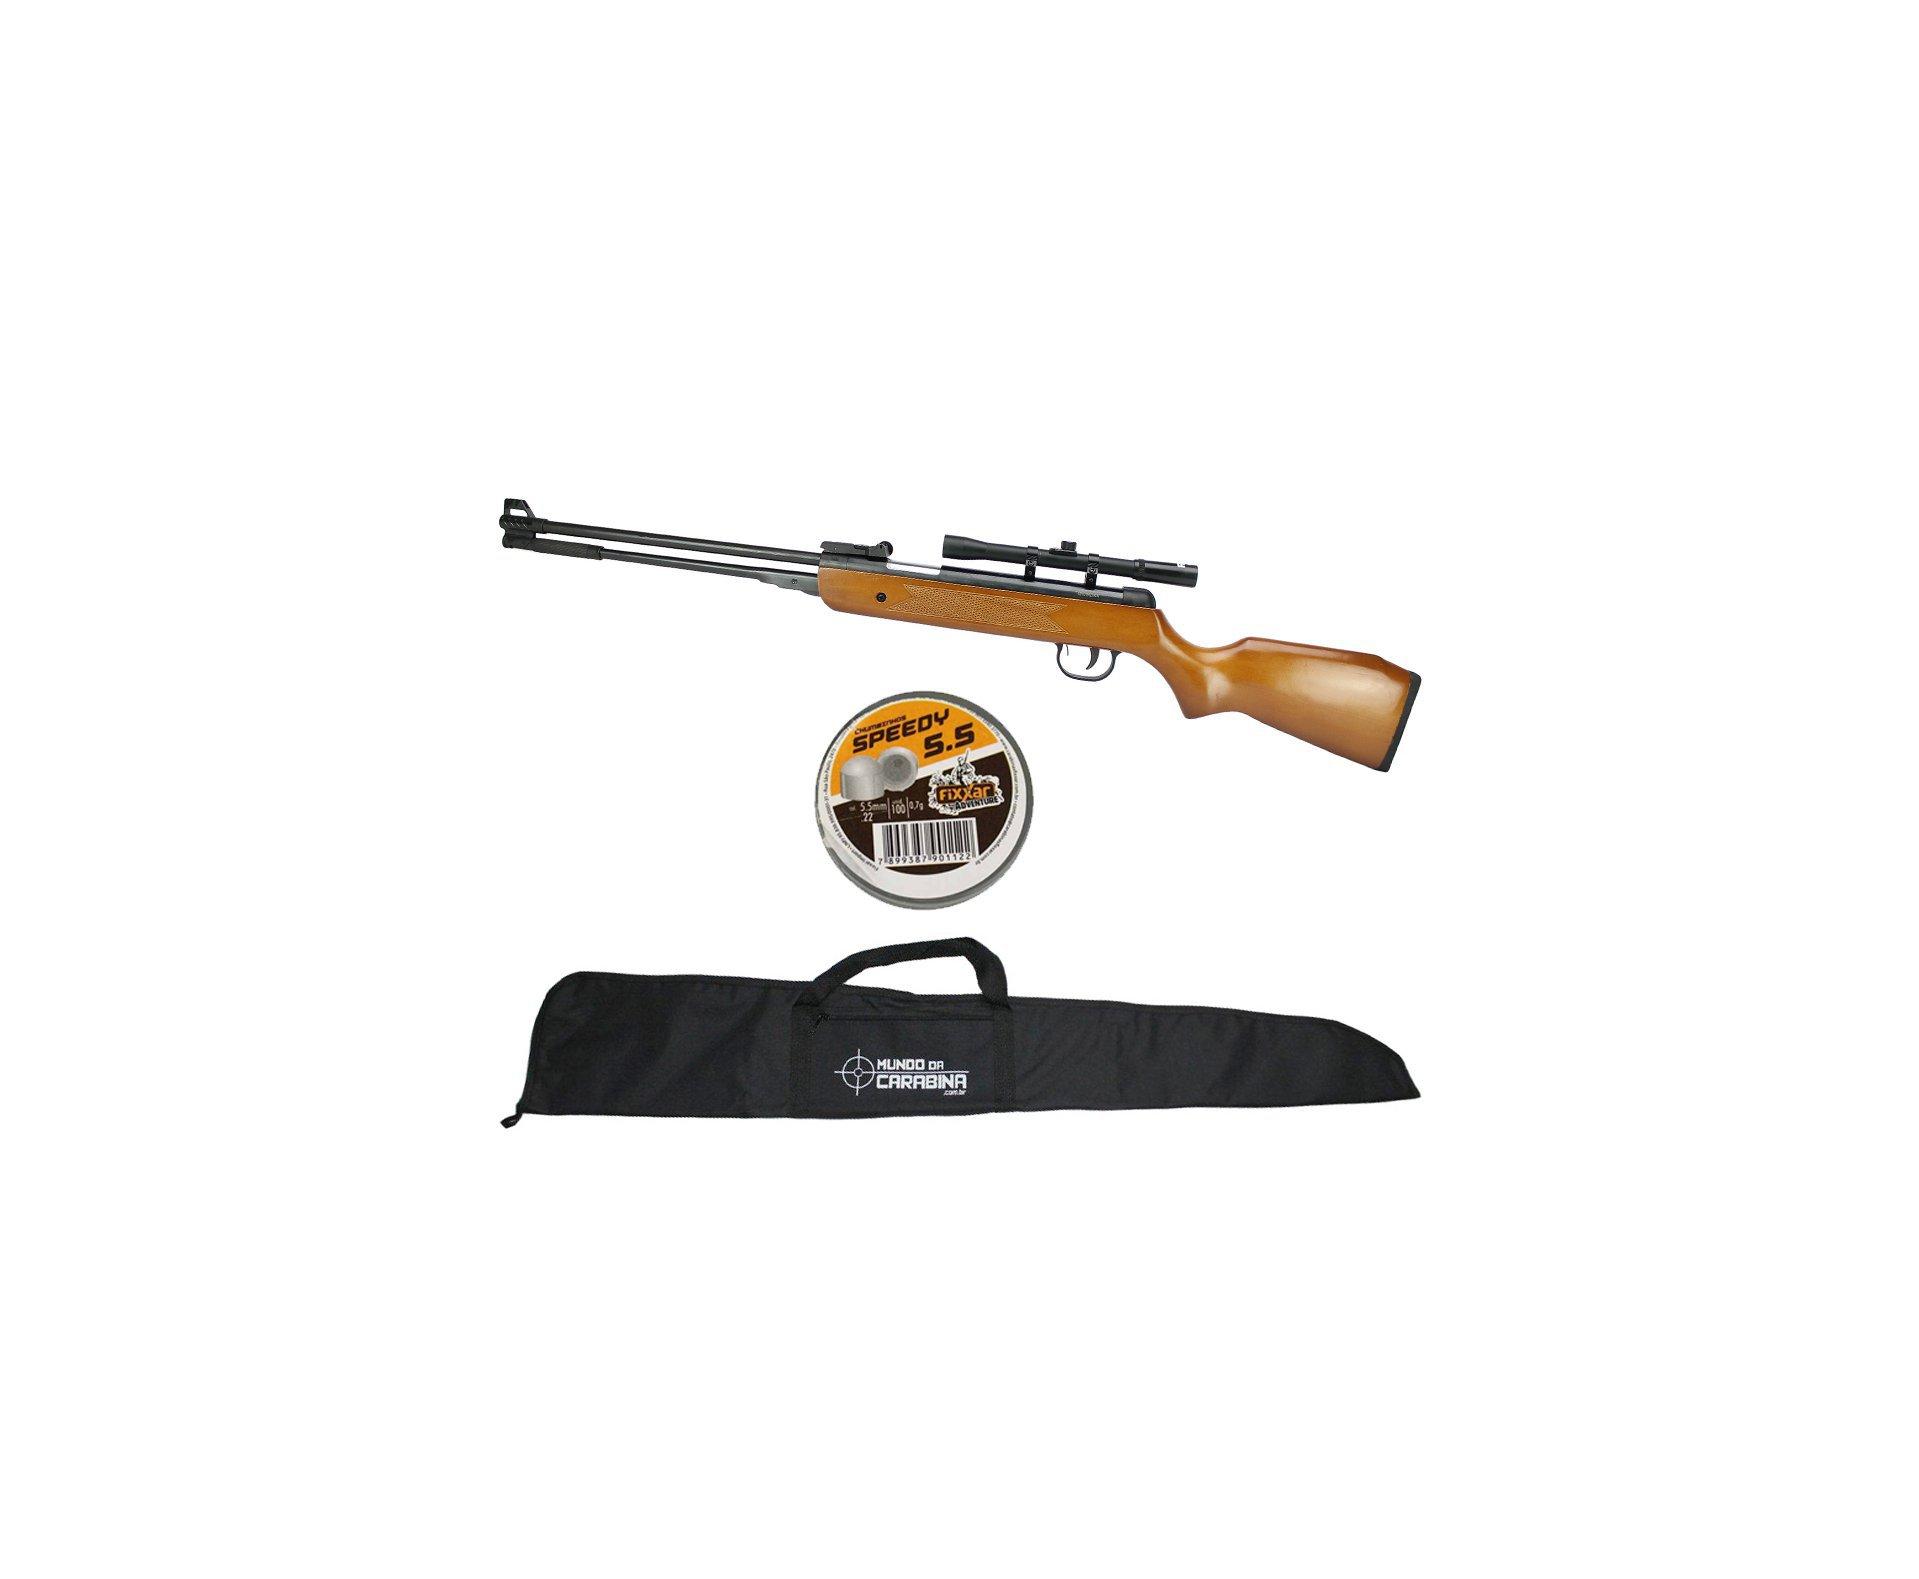 Carabina De Pressão Under-b Wf600 Cal 5,5mm Wood - Qgk Spa + Luneta 4x20 + Capa + Chumbinho